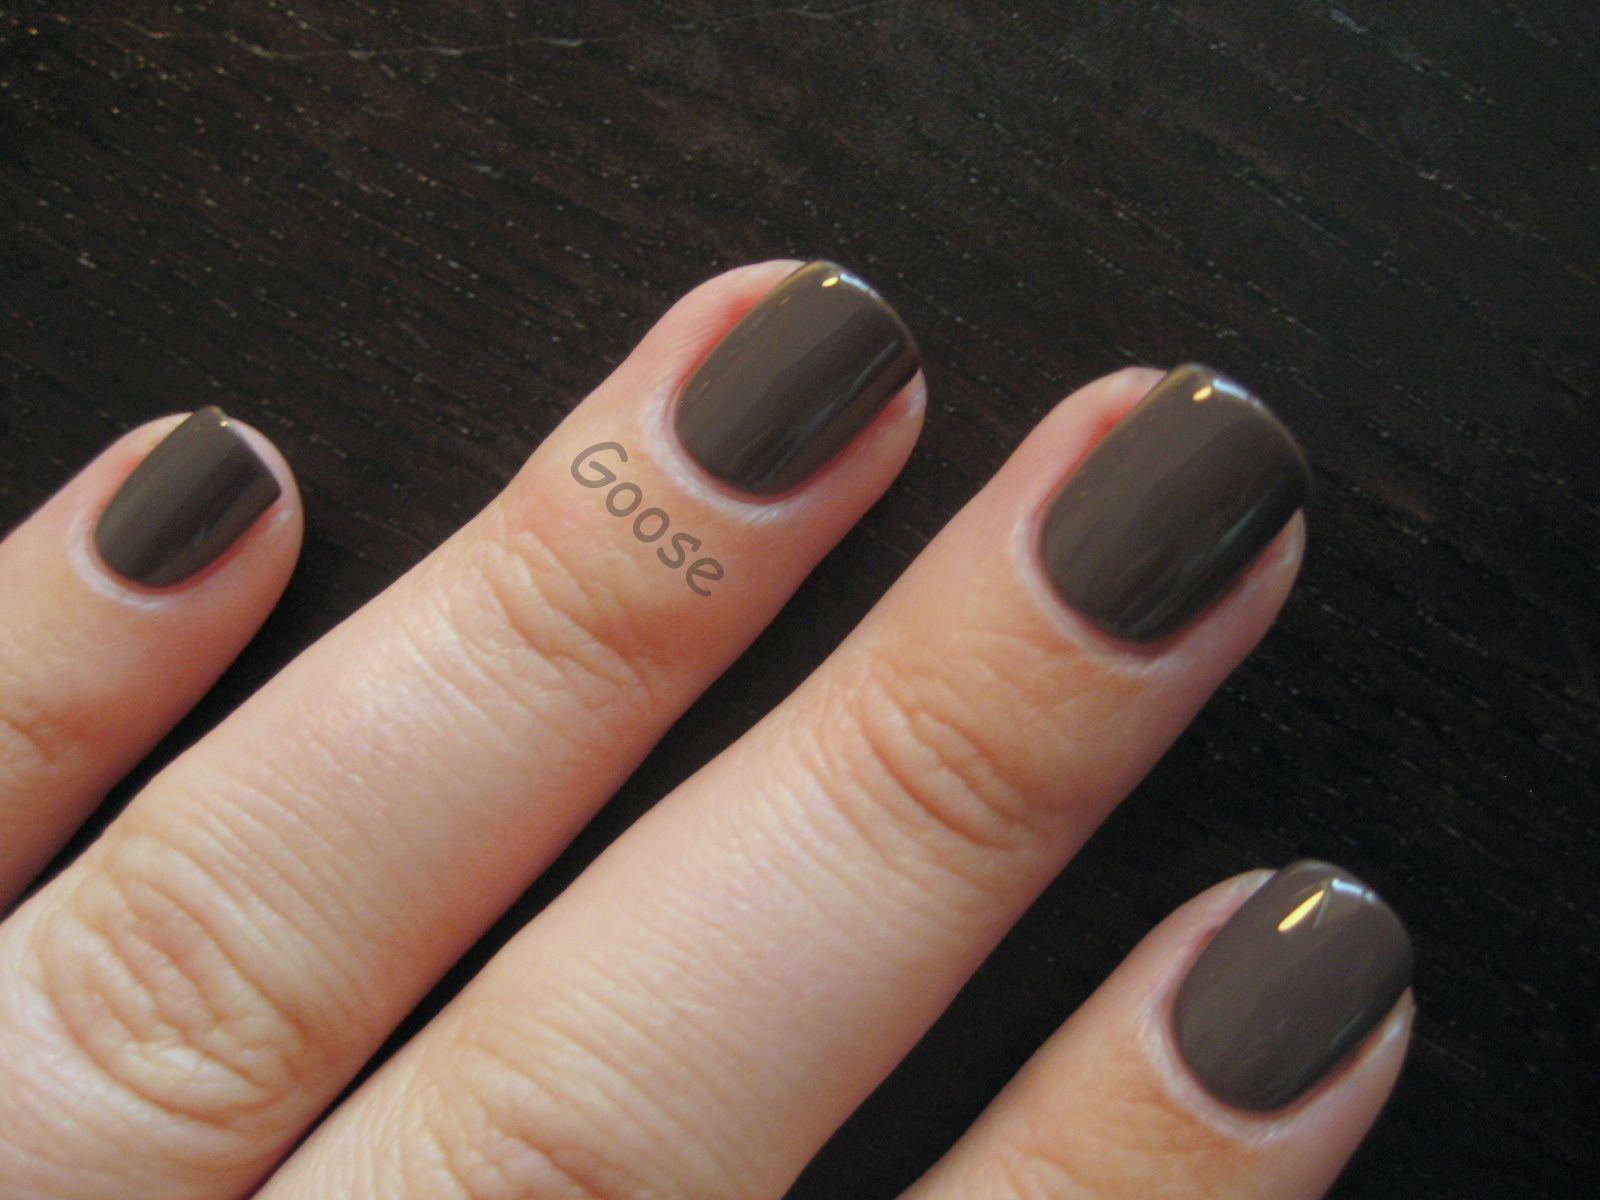 Goose\'s Glitter: New Nail Shape + Old Favorite | Nails | Pinterest ...